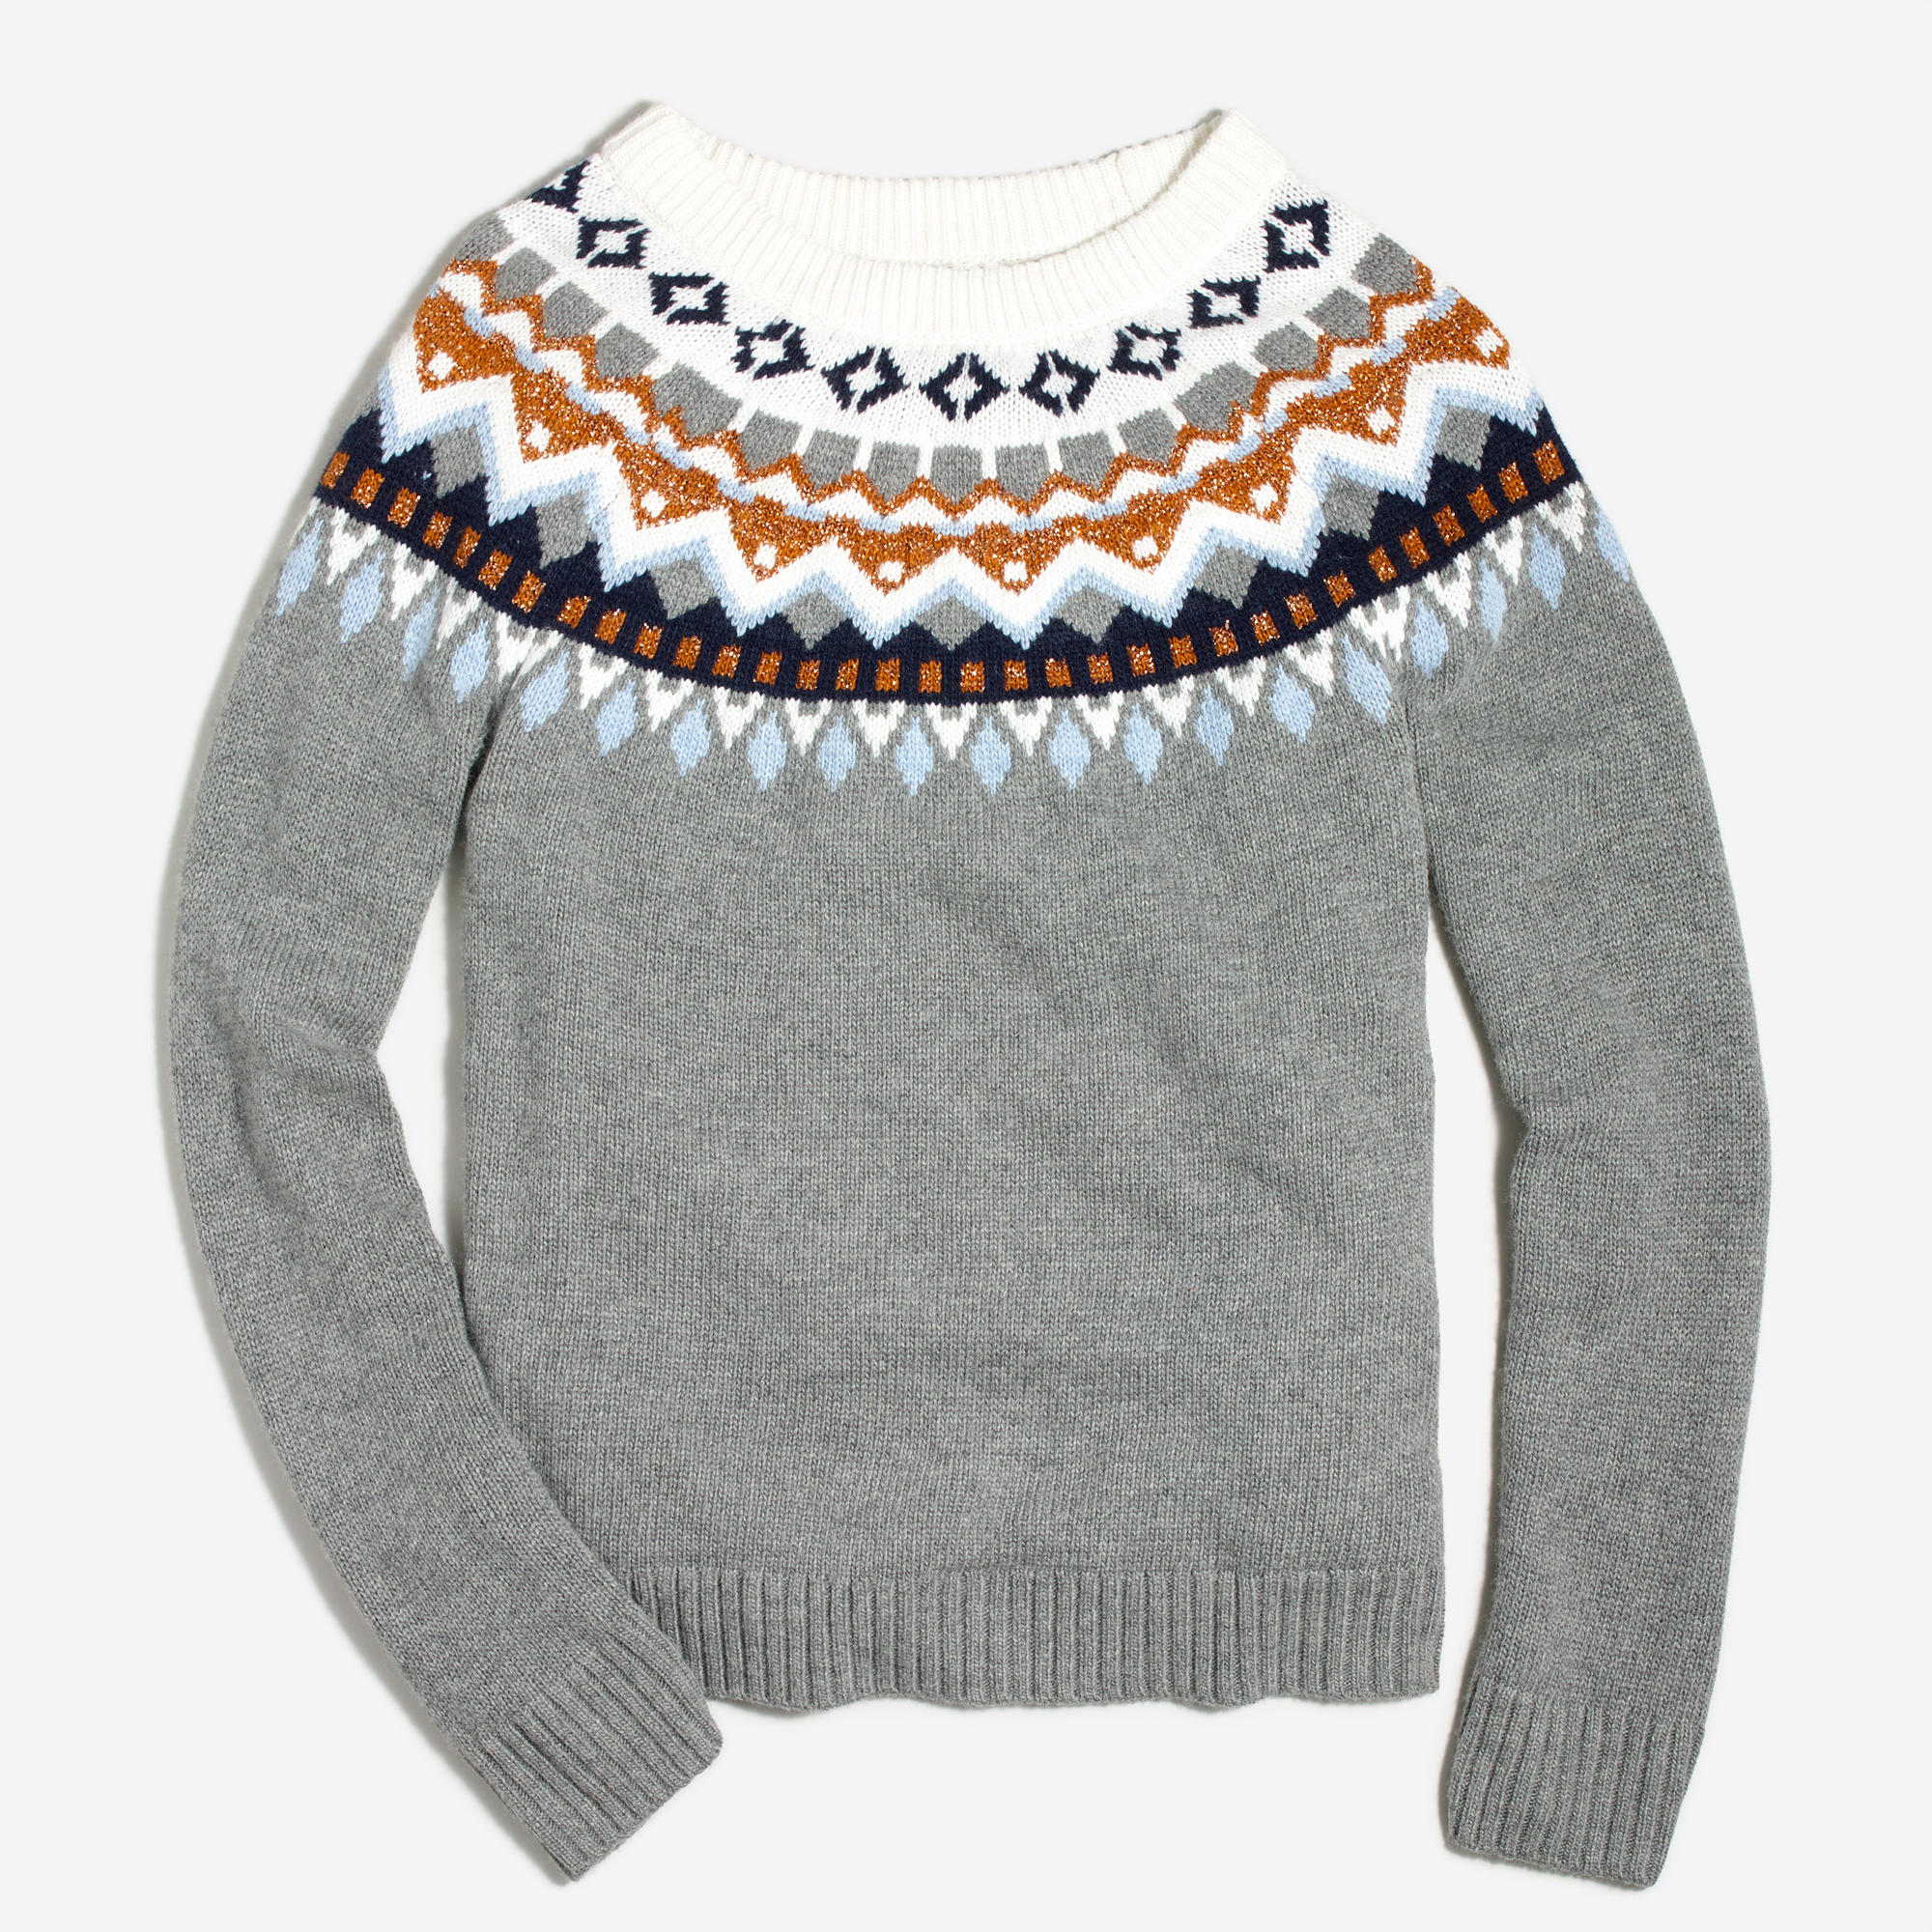 metallic fair isle sweater factorywomen pullovers factory. Black Bedroom Furniture Sets. Home Design Ideas